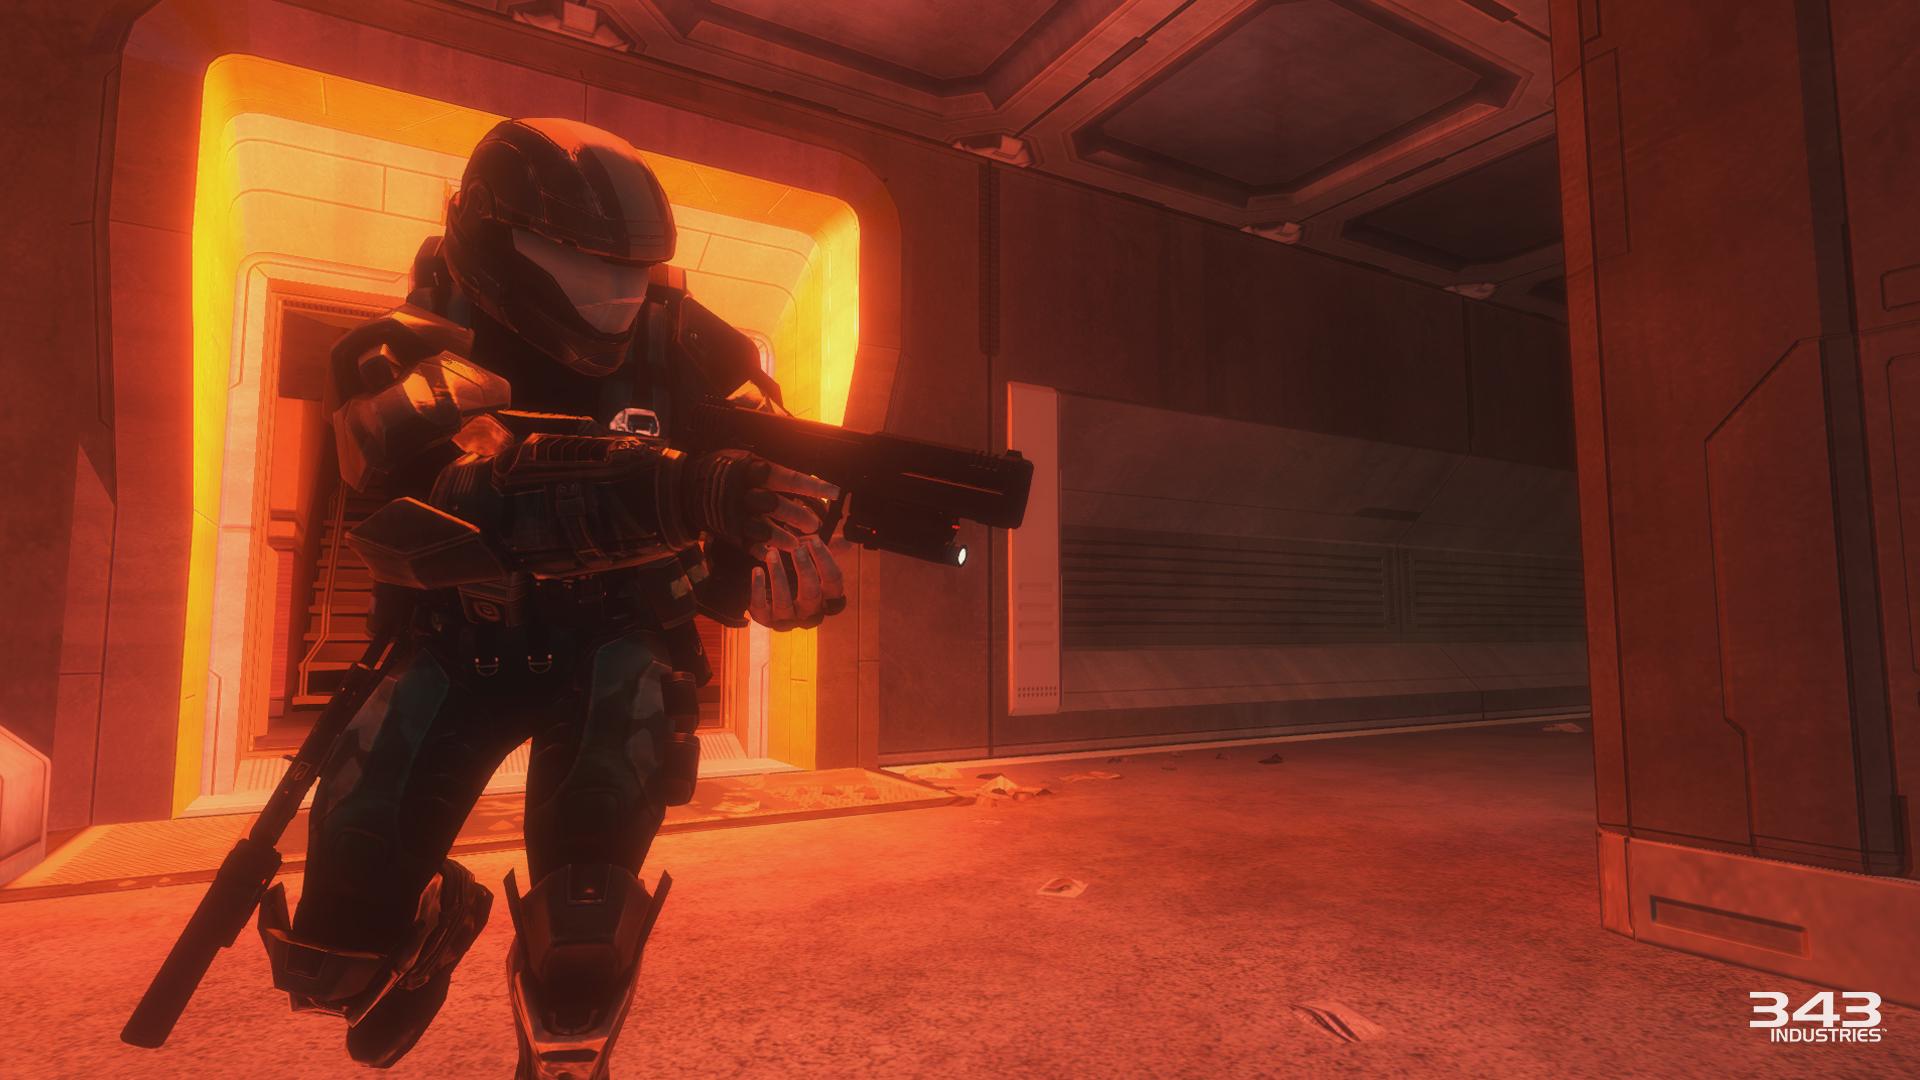 Vyšla kampaň Halo 3: ODST do Halo: The Master Chief Collection 109407